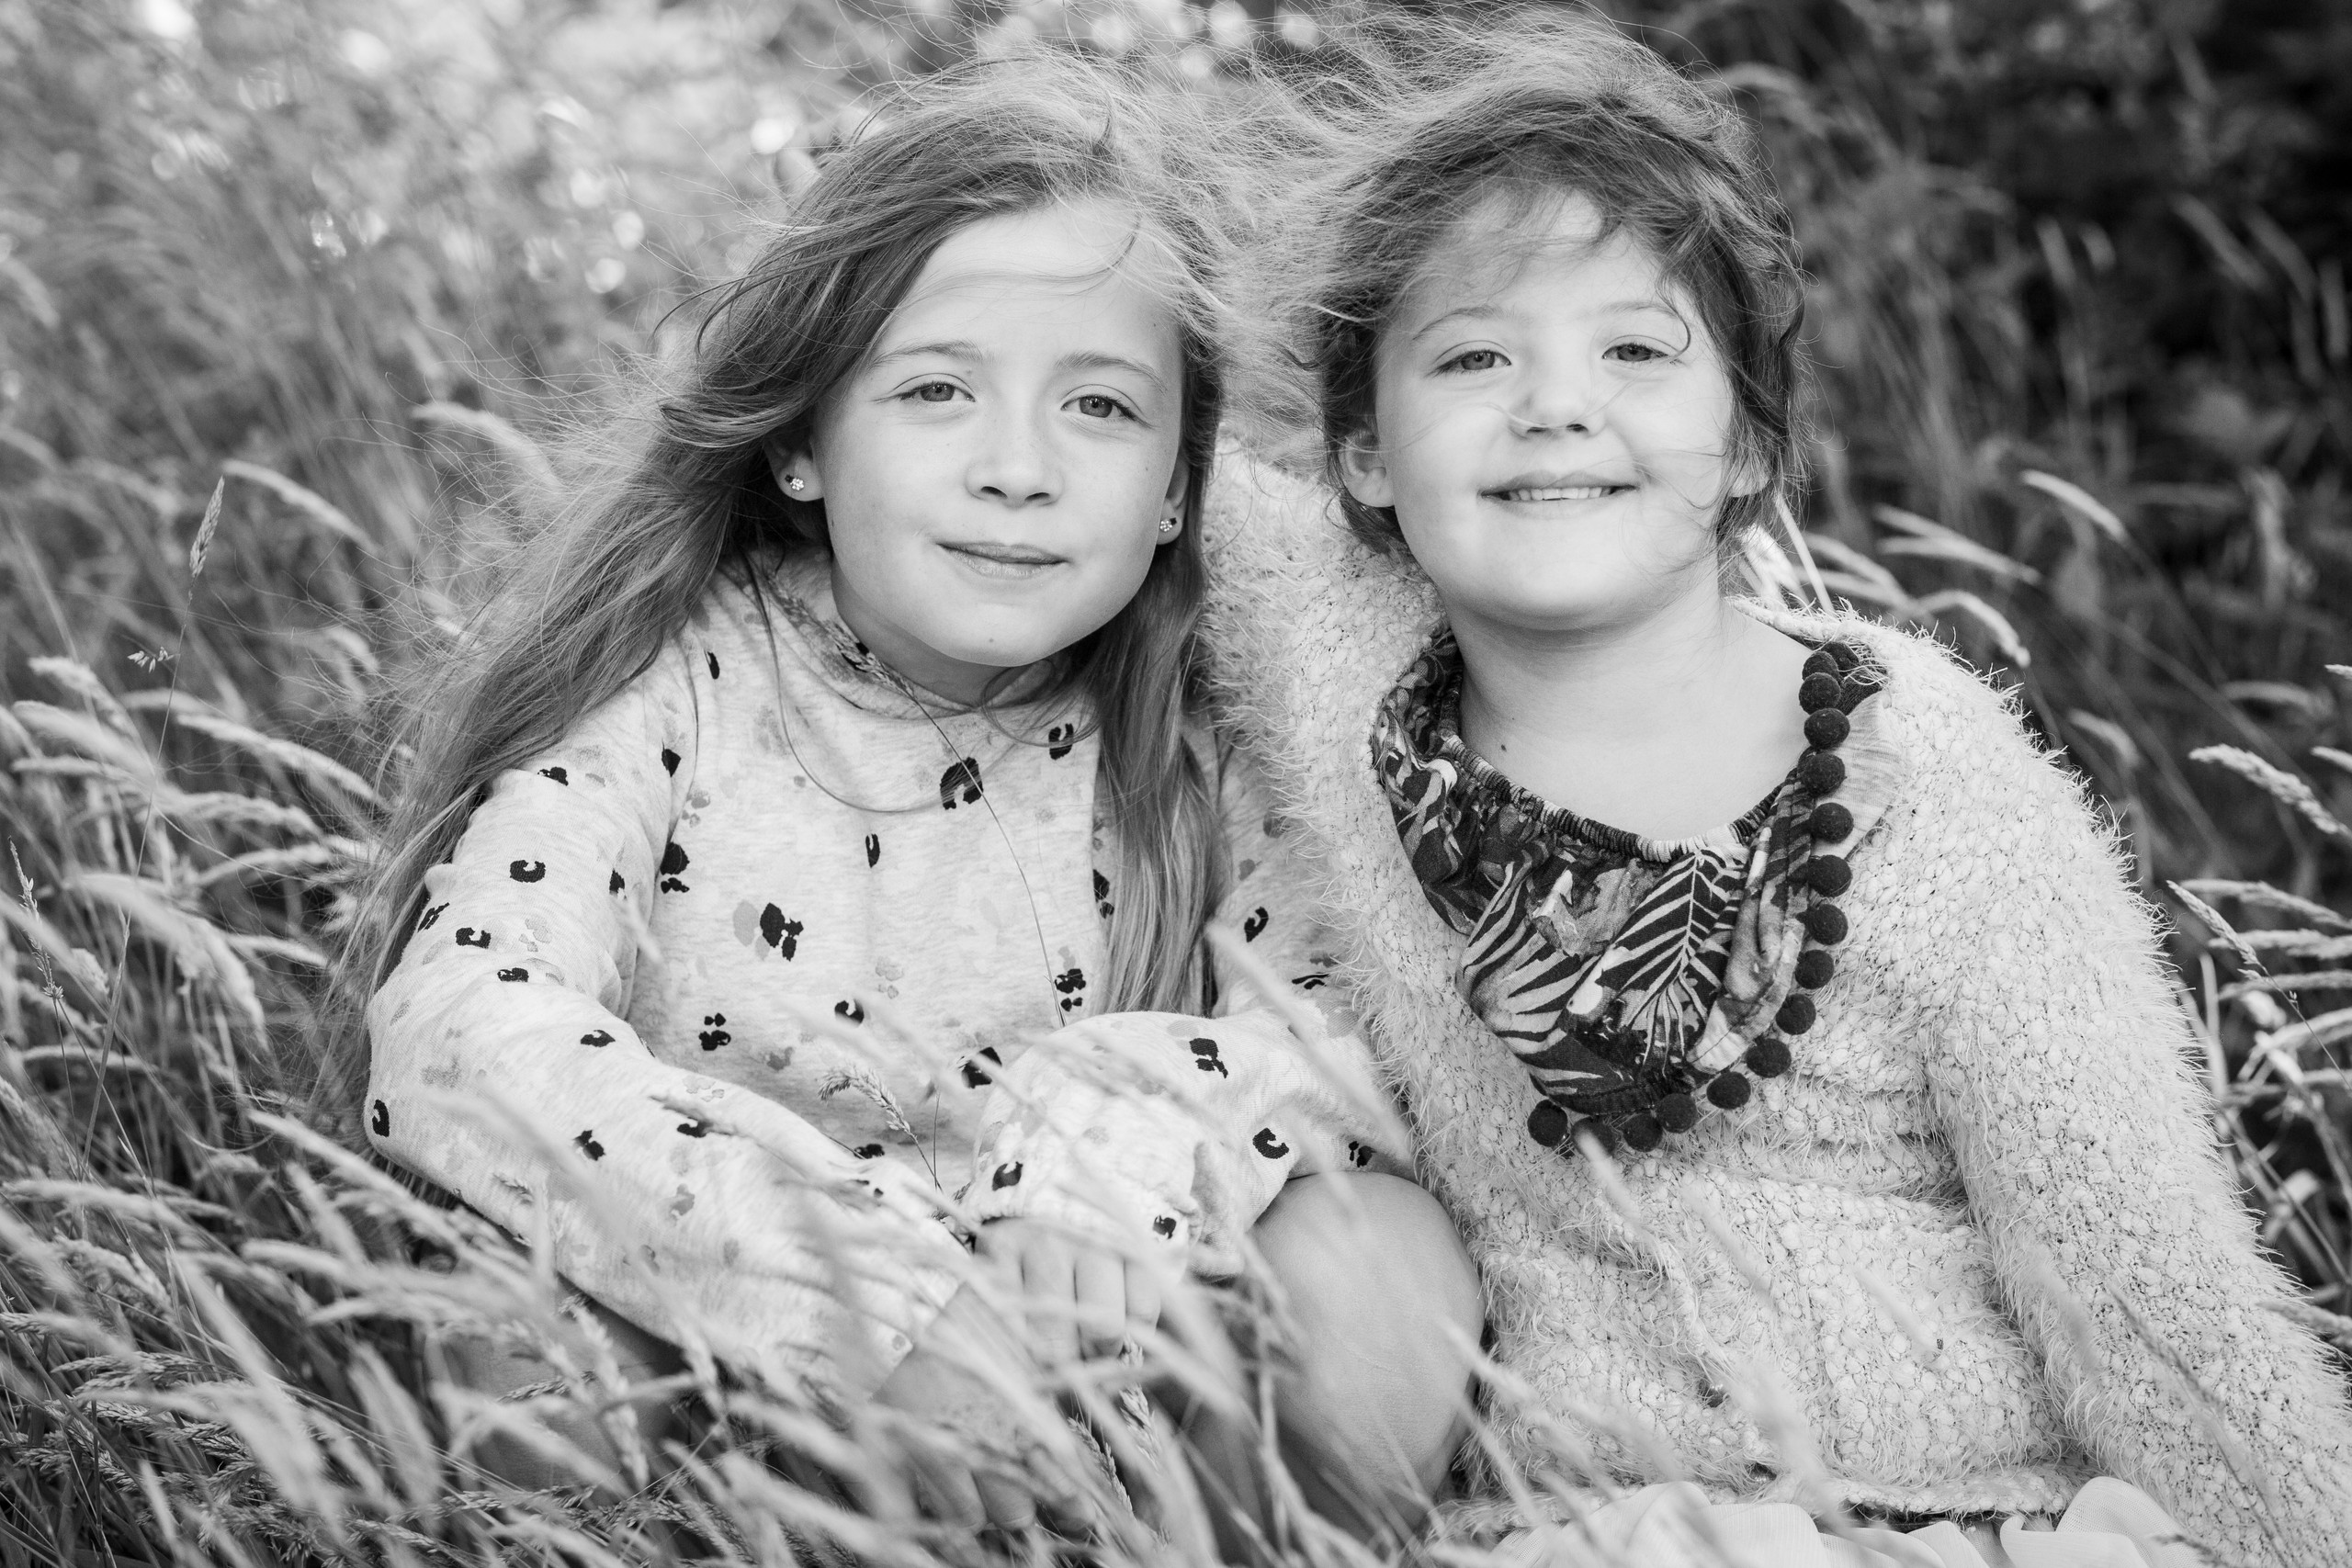 sisters pose in swansea woodland